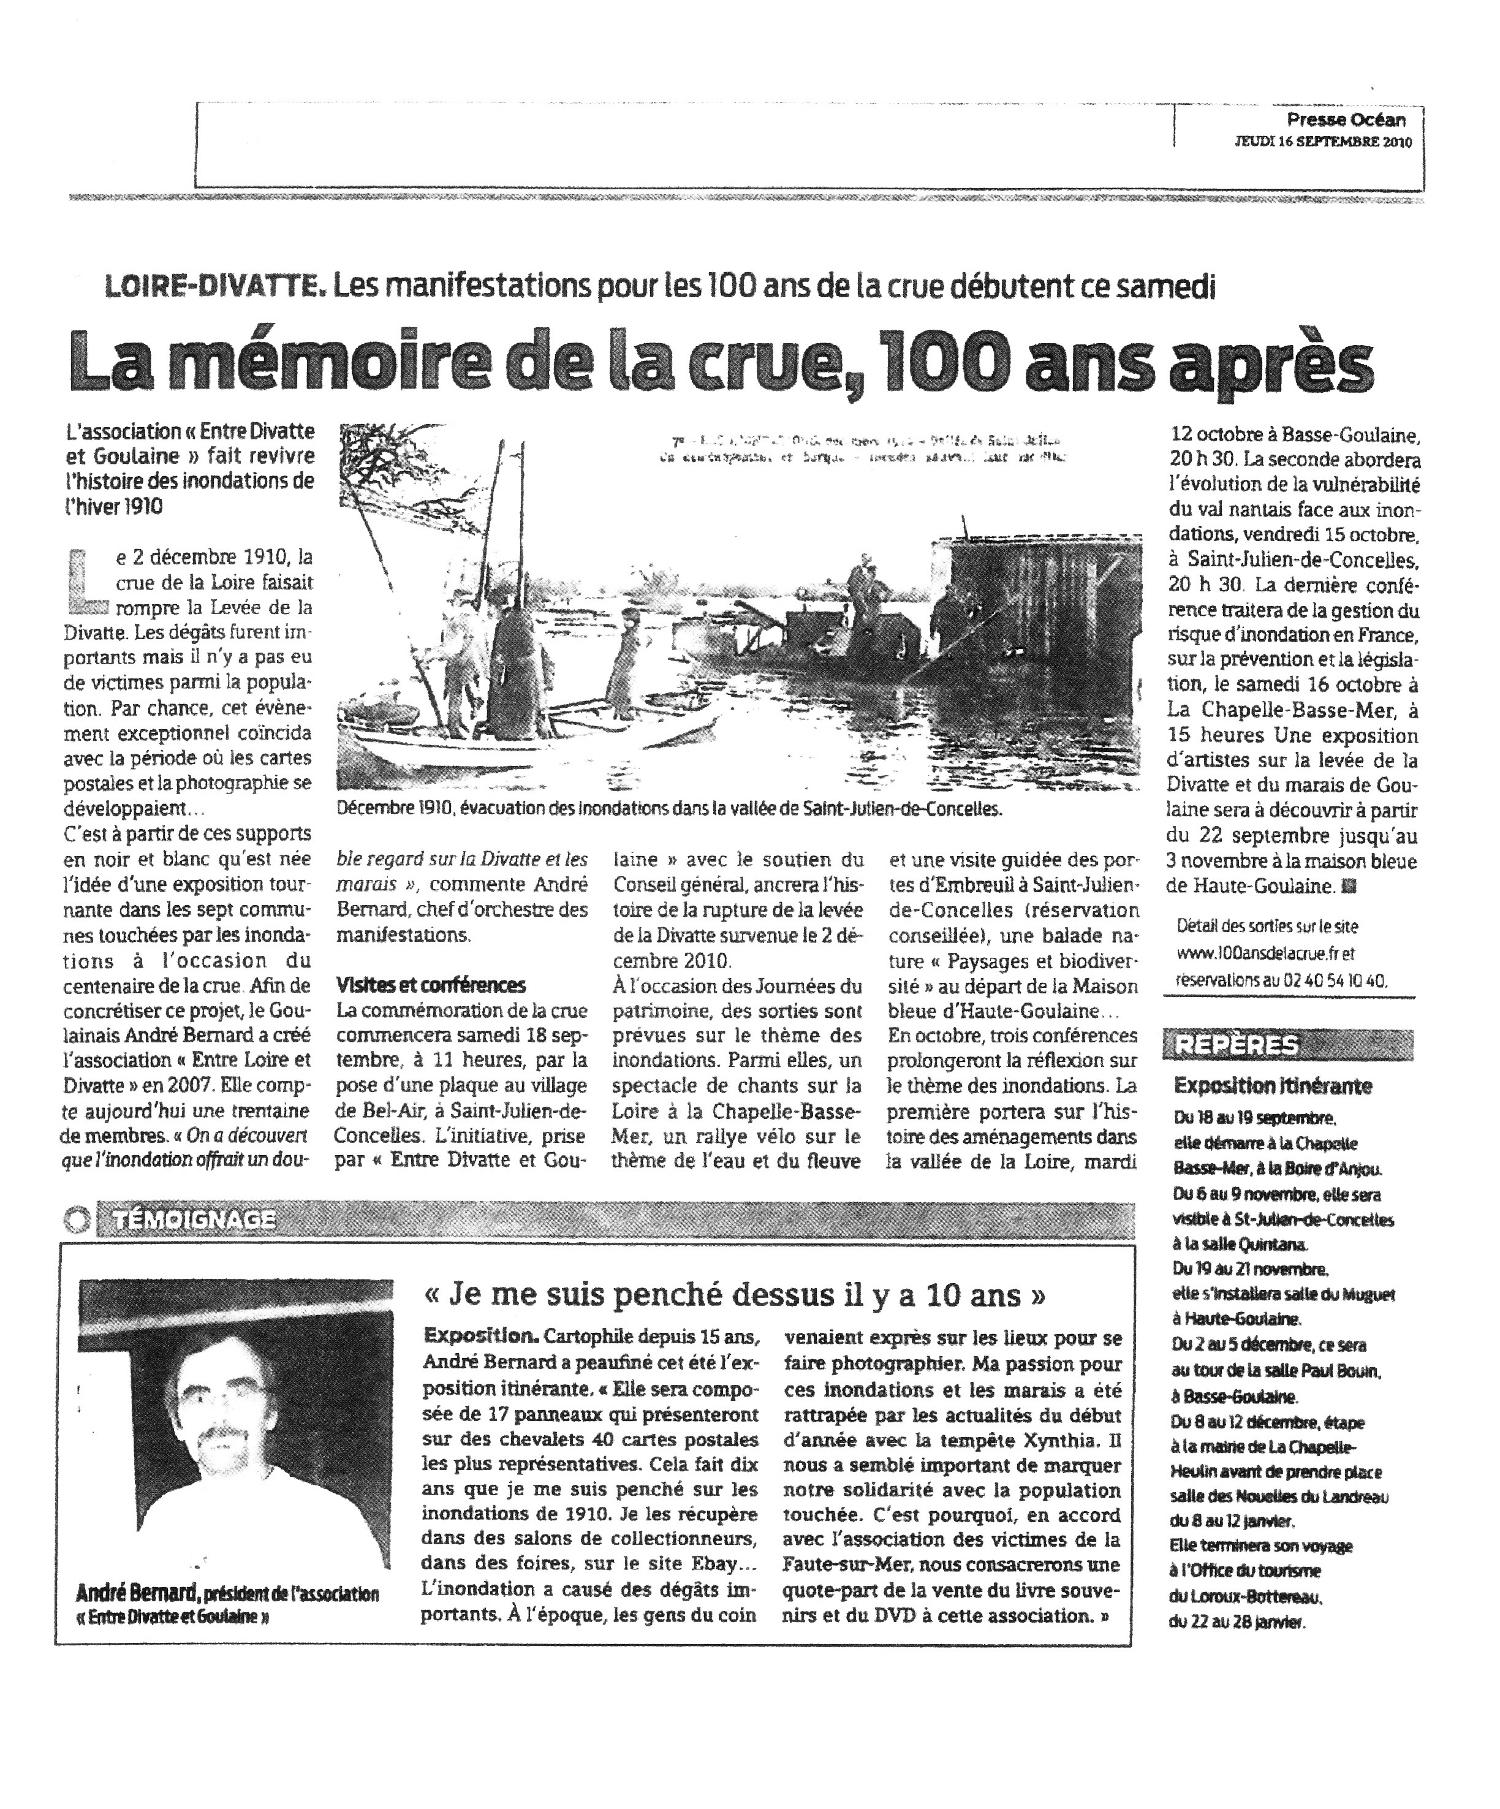 Presse ocean bis 16 septembre 2010